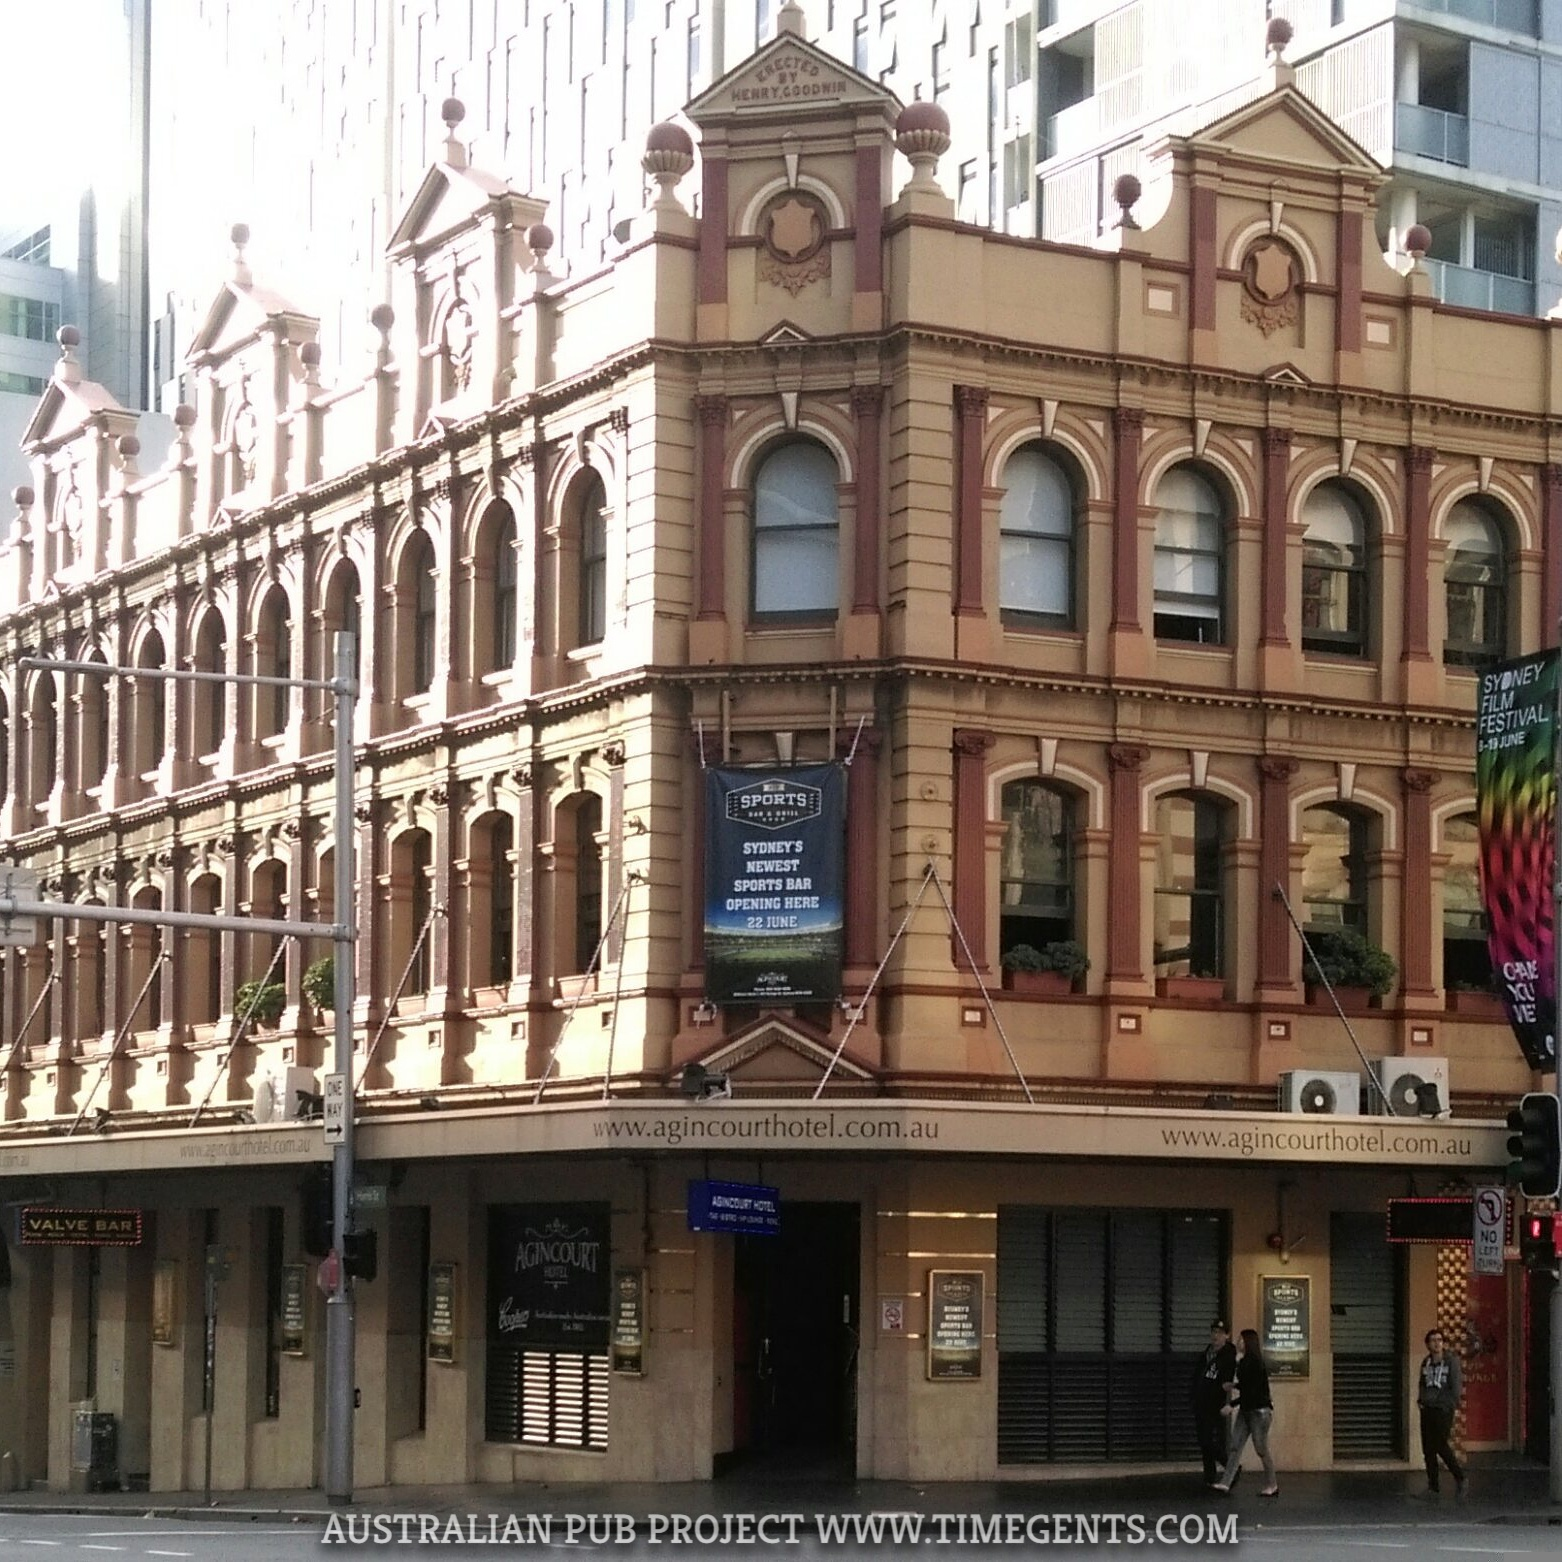 Feature pub: Agincourt Hotel, Broadway Sydney